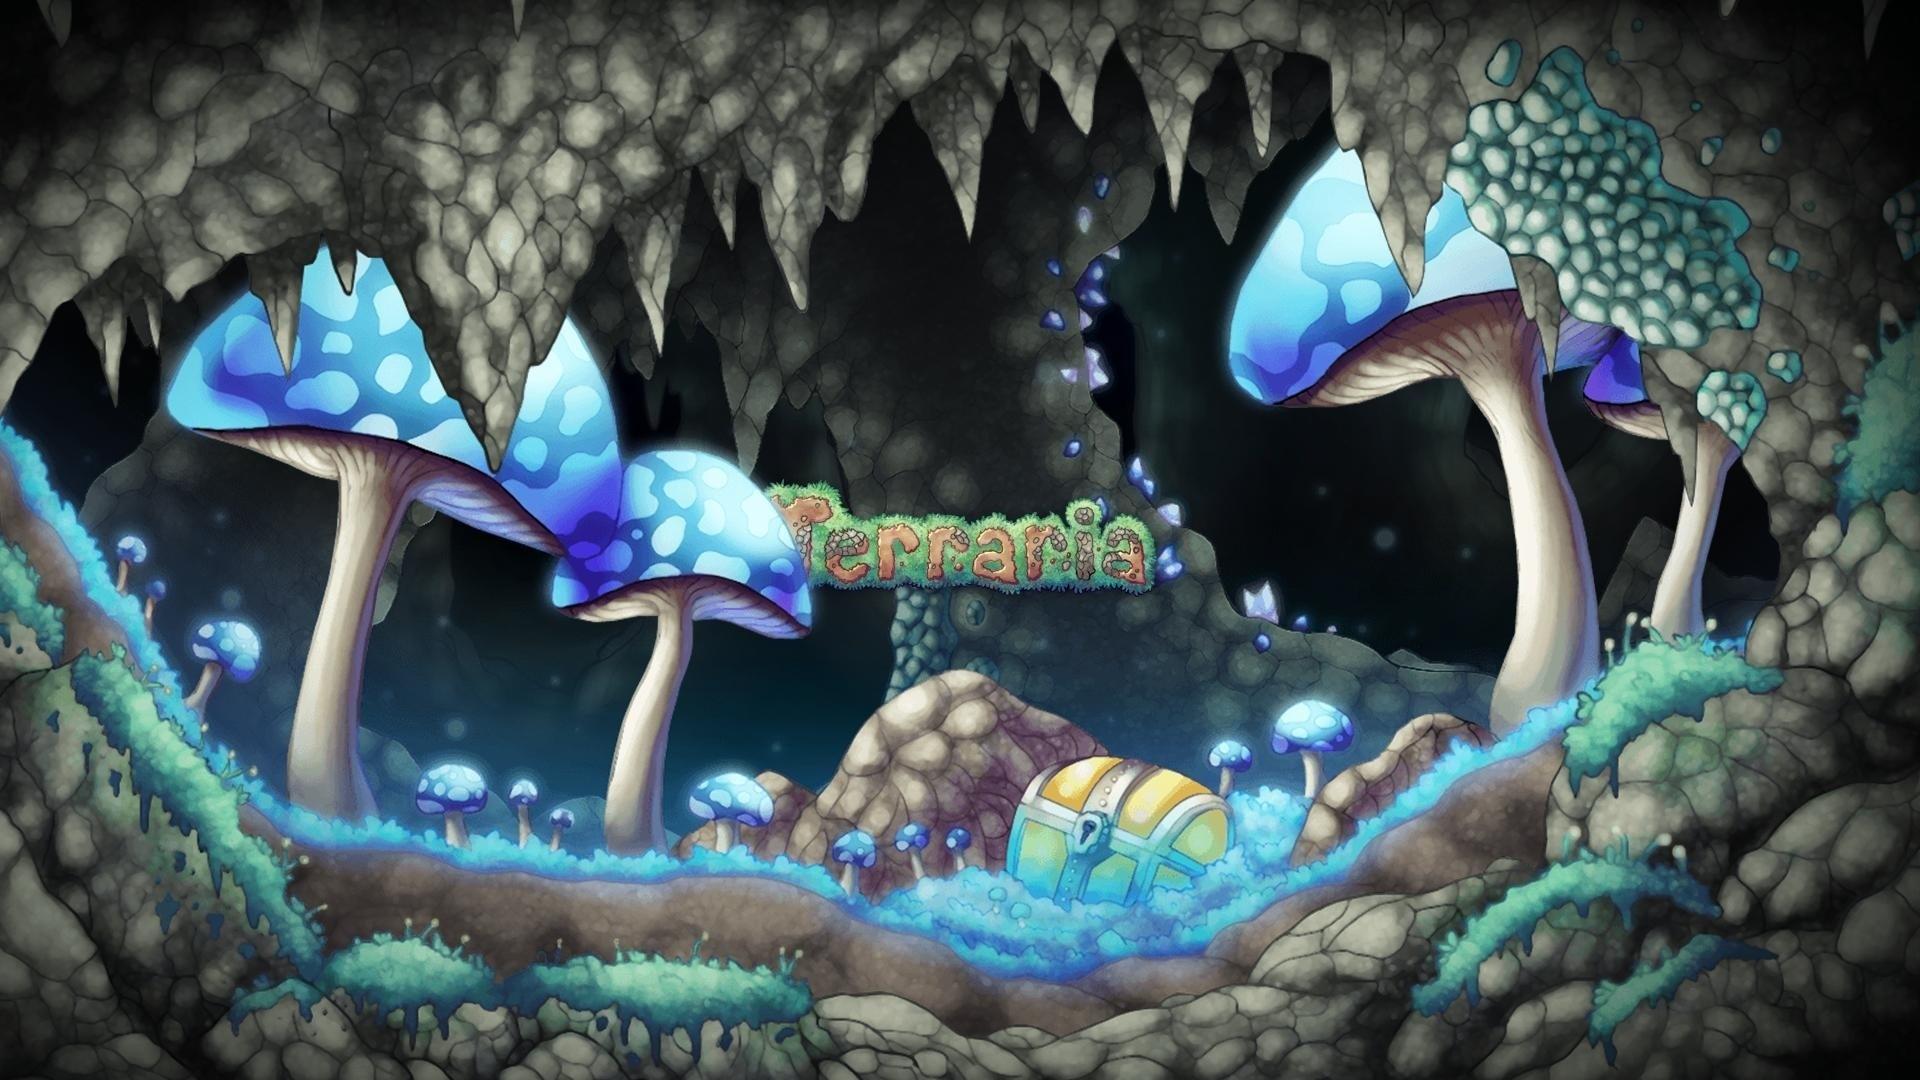 Terraria Desktop wallpaper